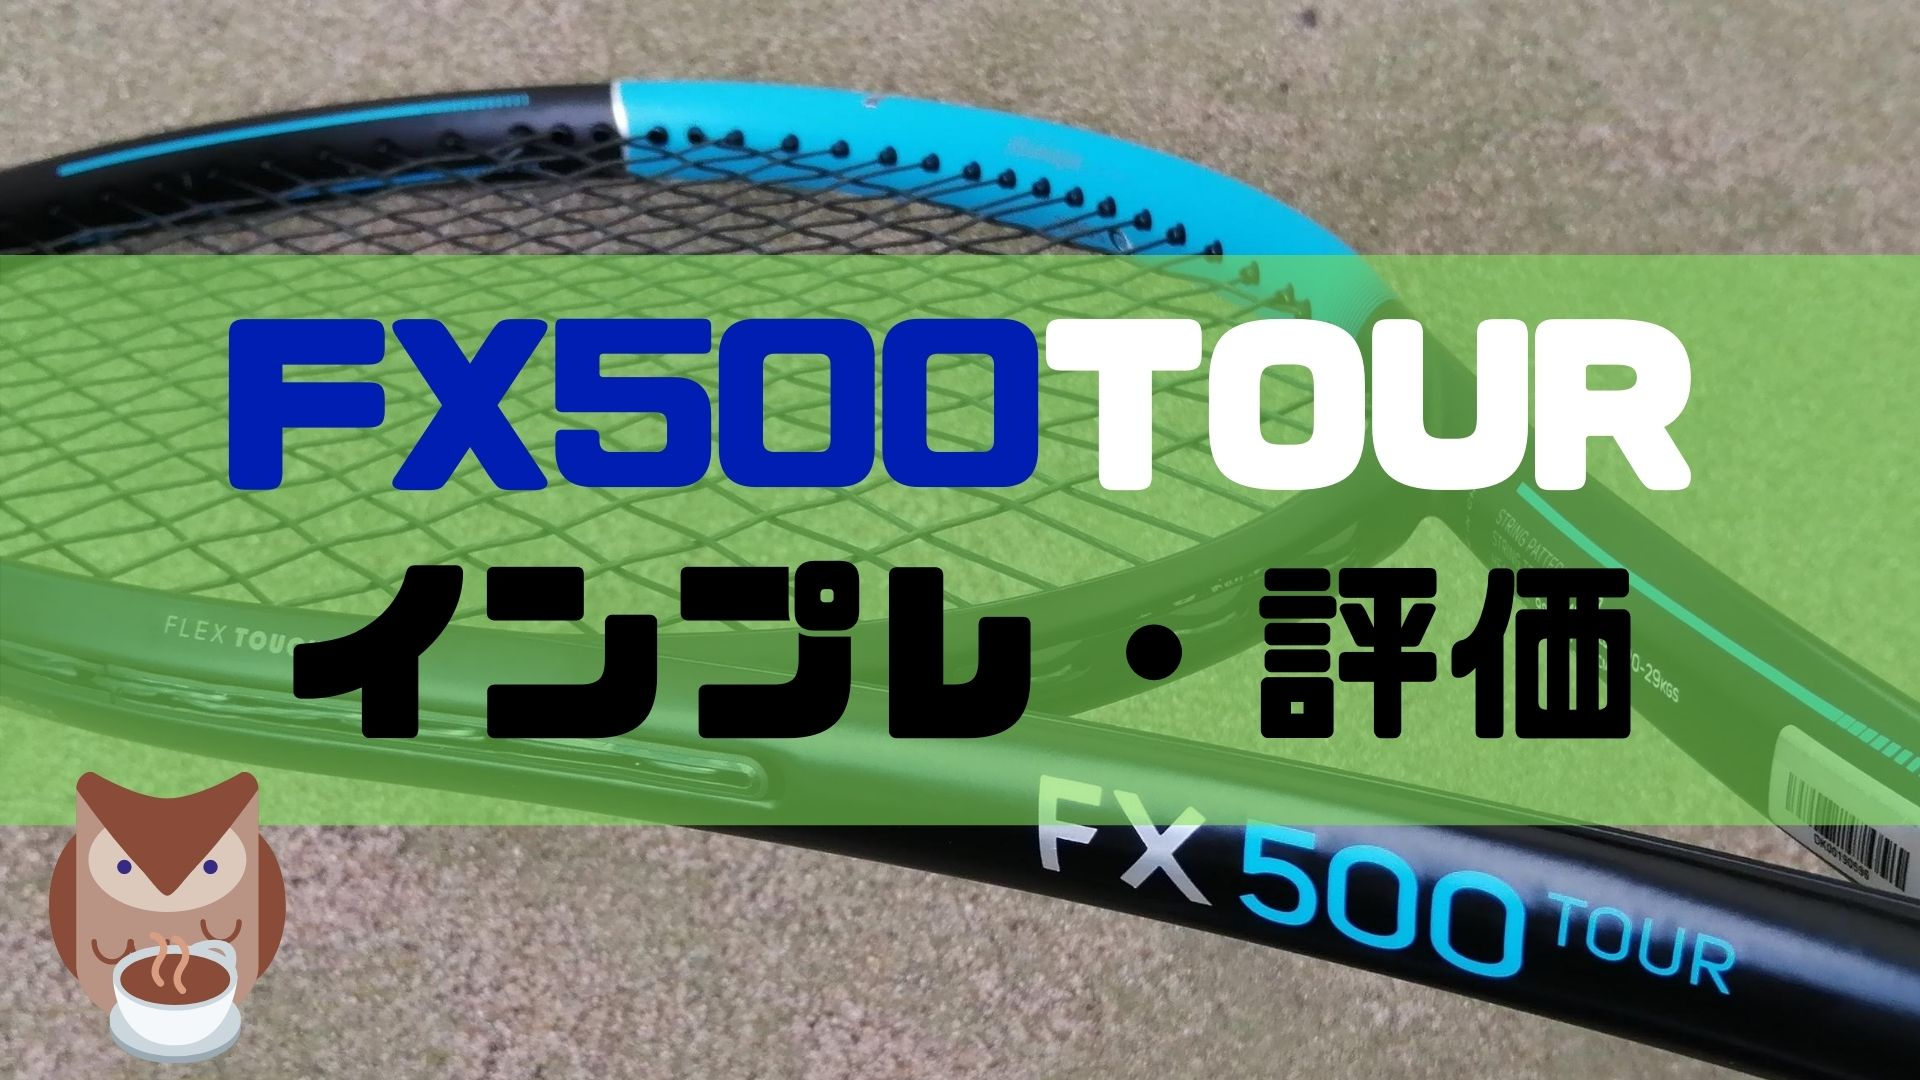 FX500 TOUR ダンロップ【インプレ評価】DUNLOP 新FXシリーズ